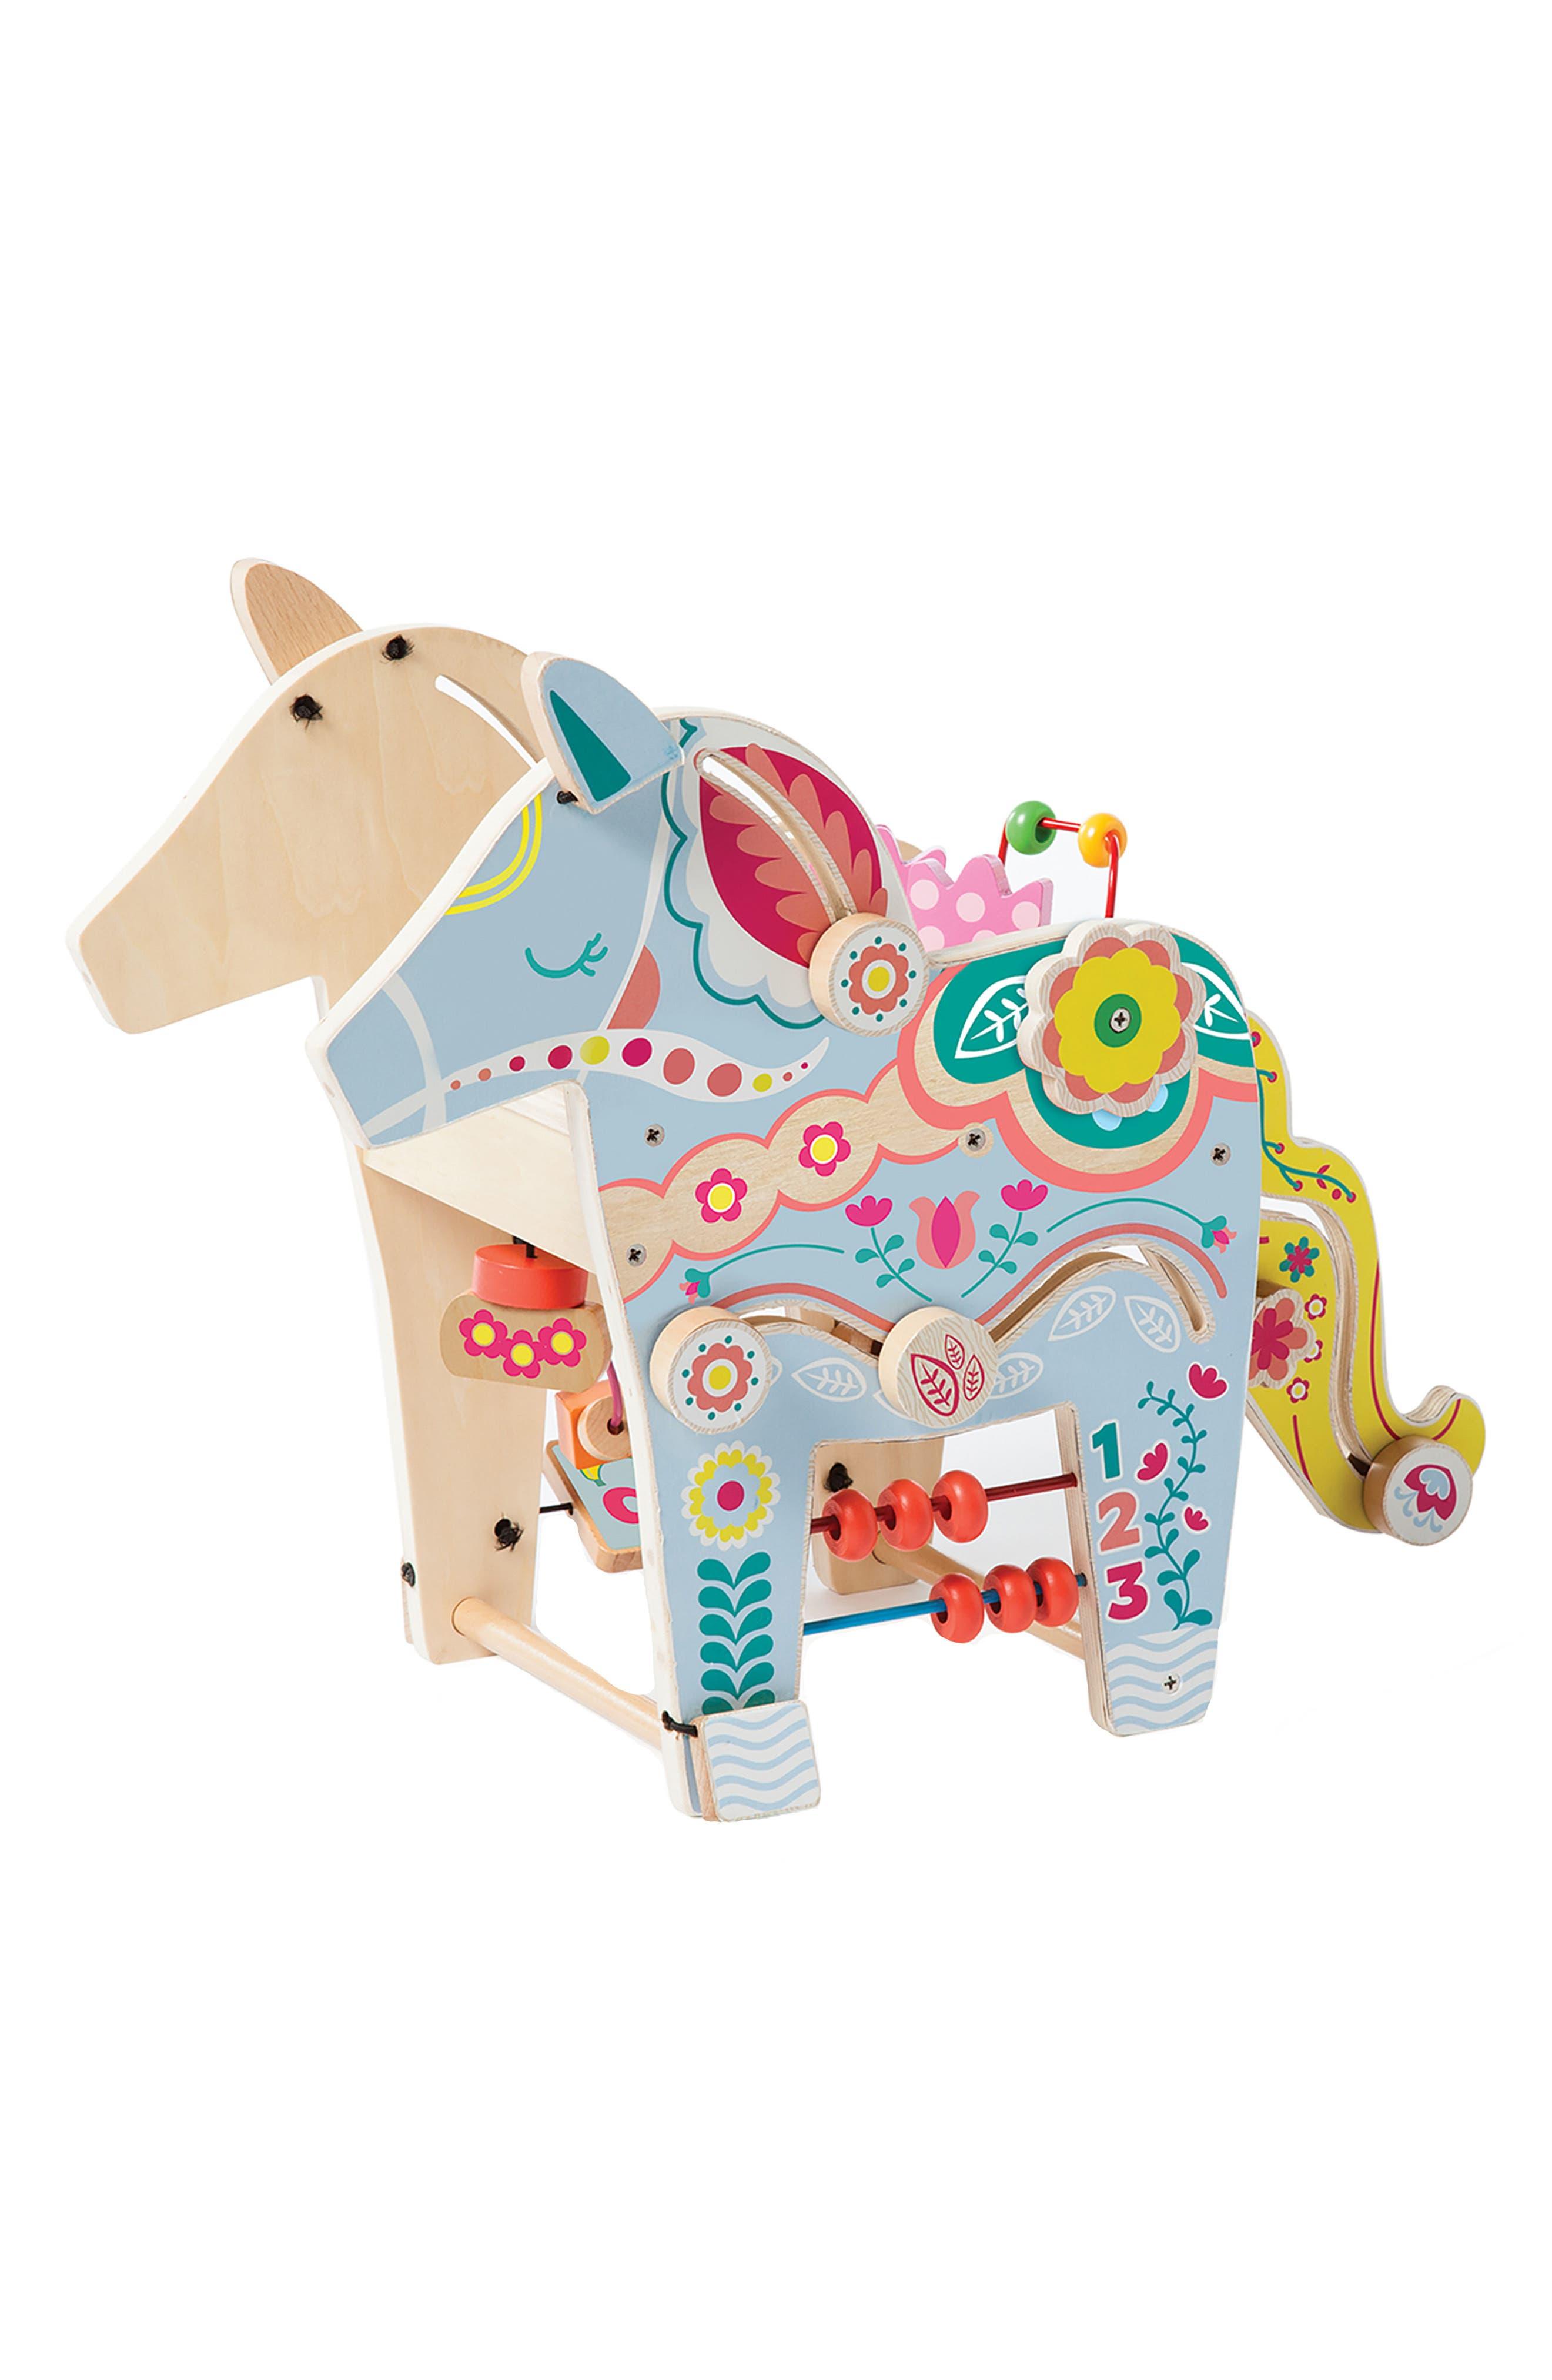 Manhattan Toys Wooden Playful Pony Activity Center